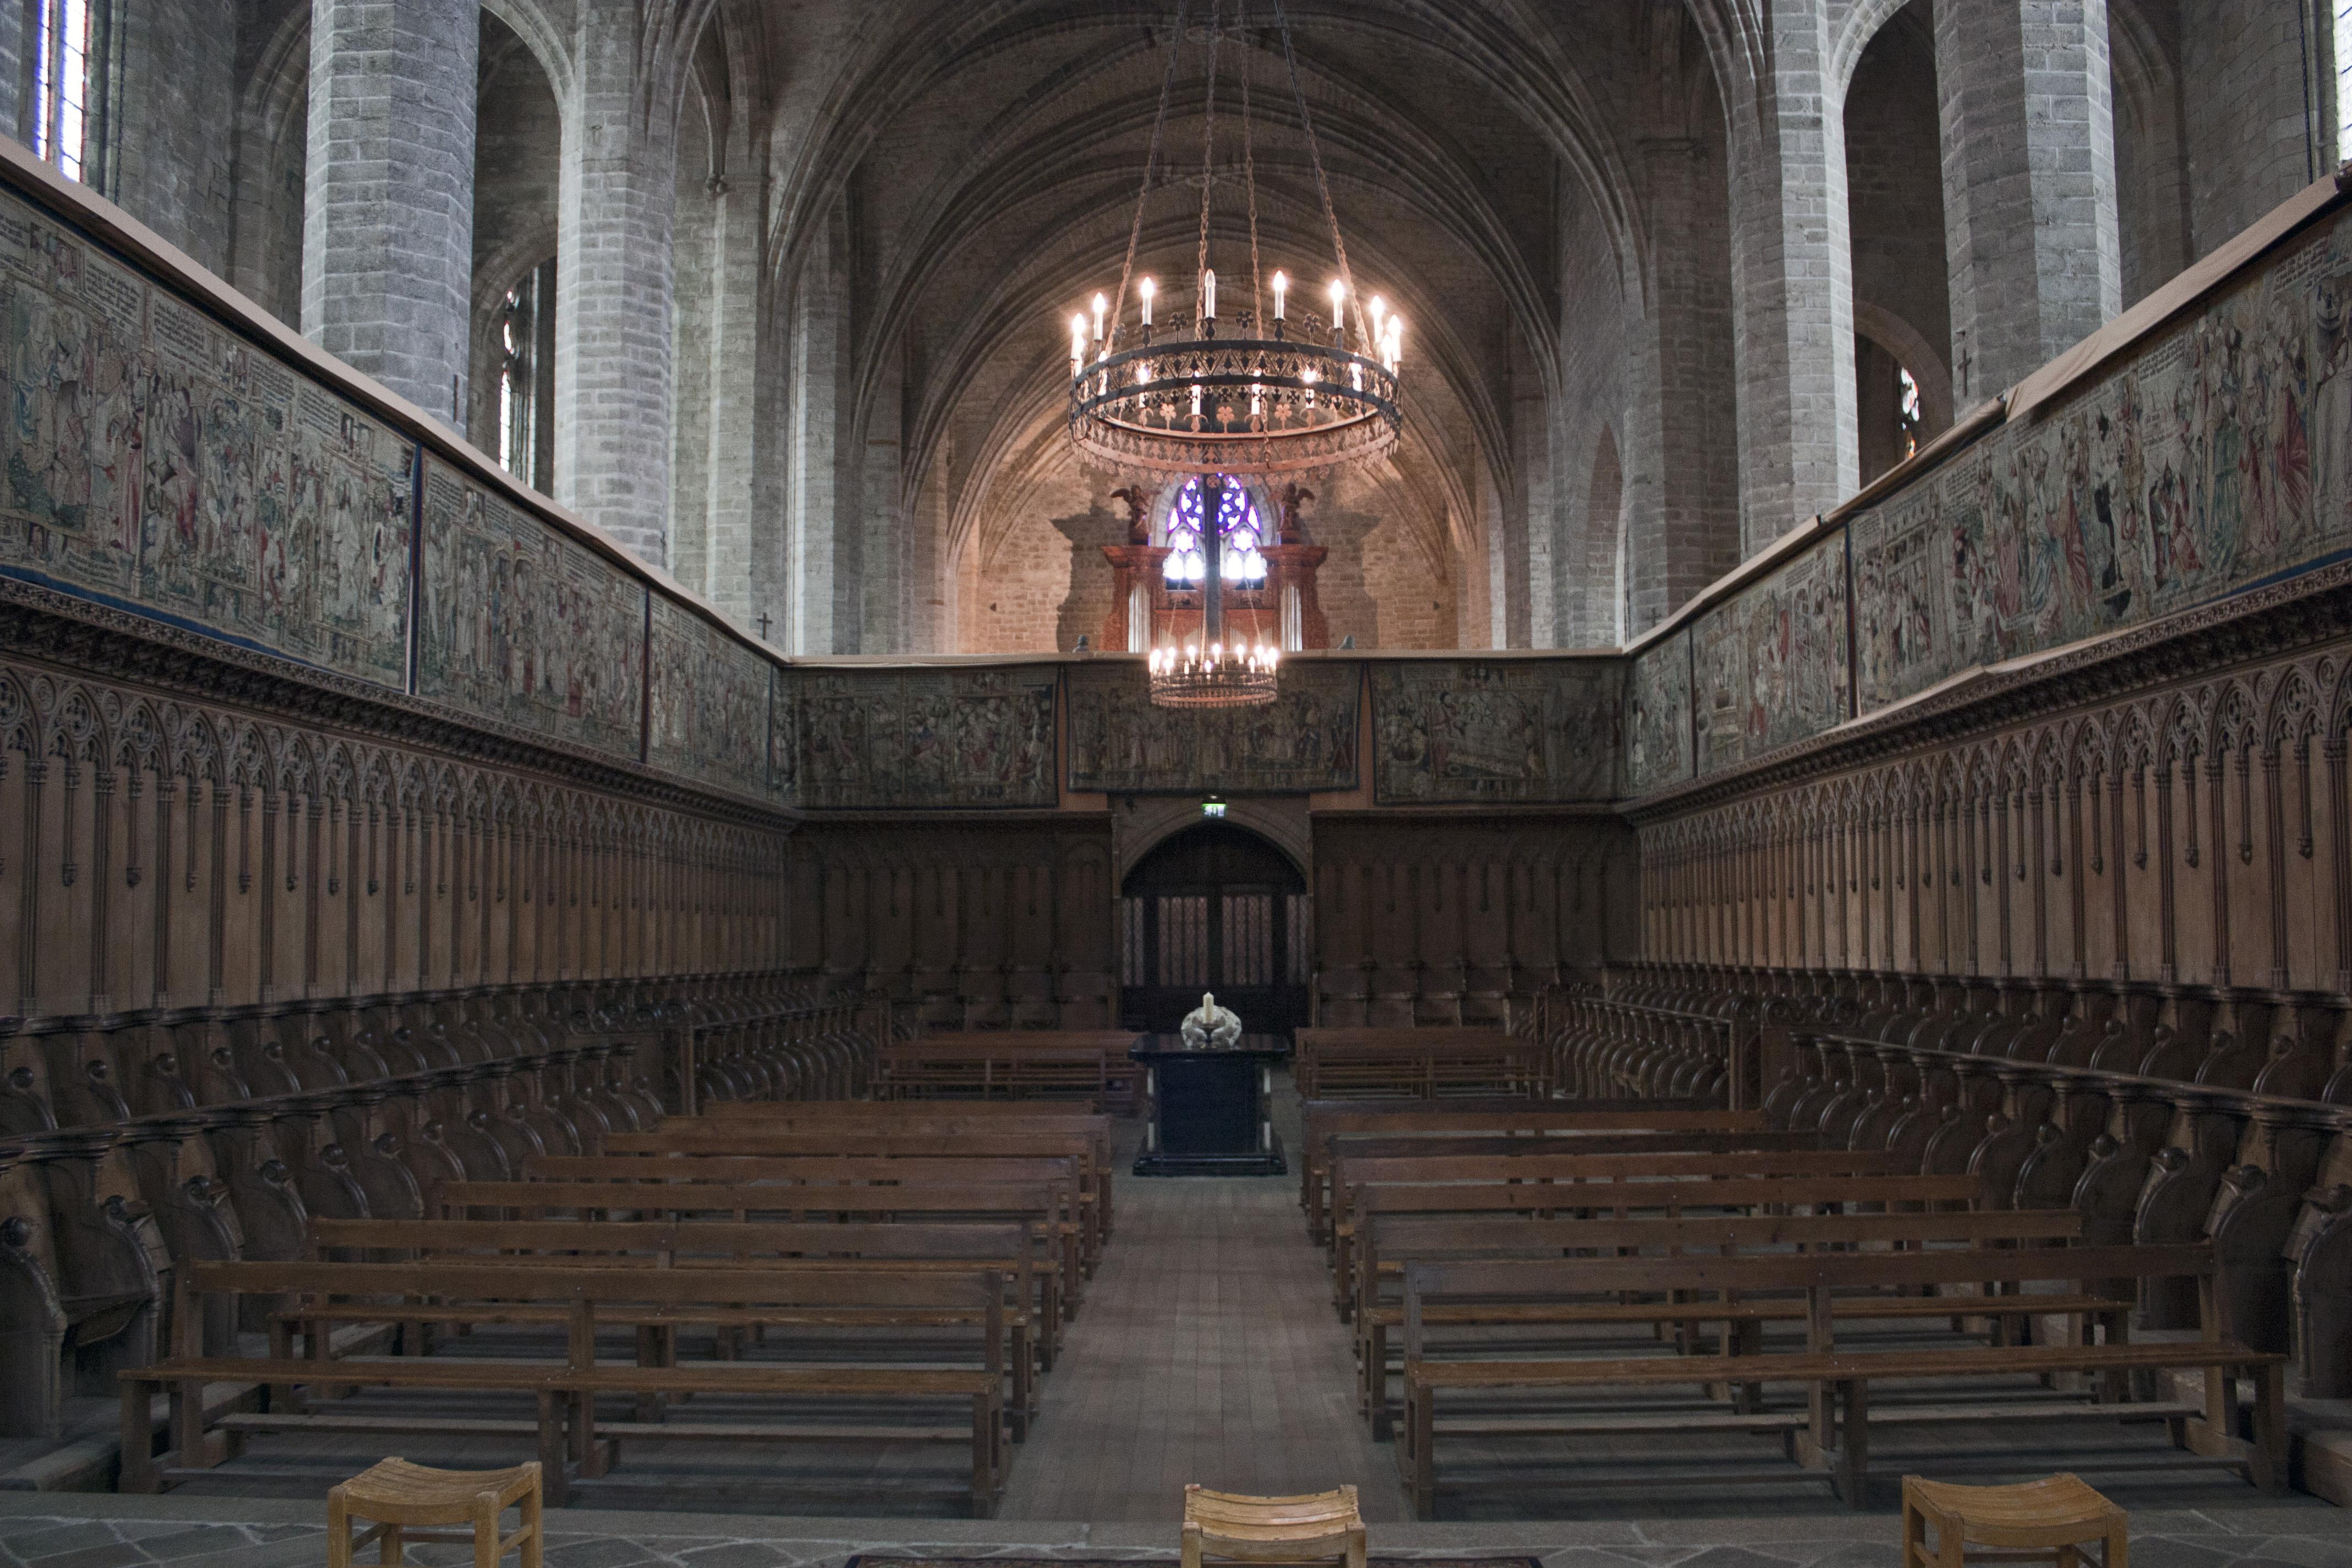 file abbaye robert de la chaise dieu chœur monastique 201121007 jpg wikimedia commons